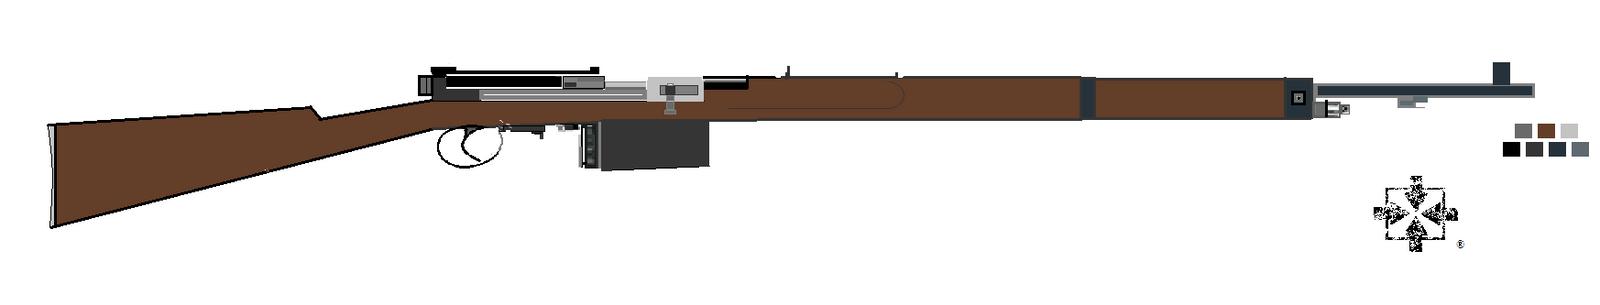 Mondragon Rifle by 96blackarrow